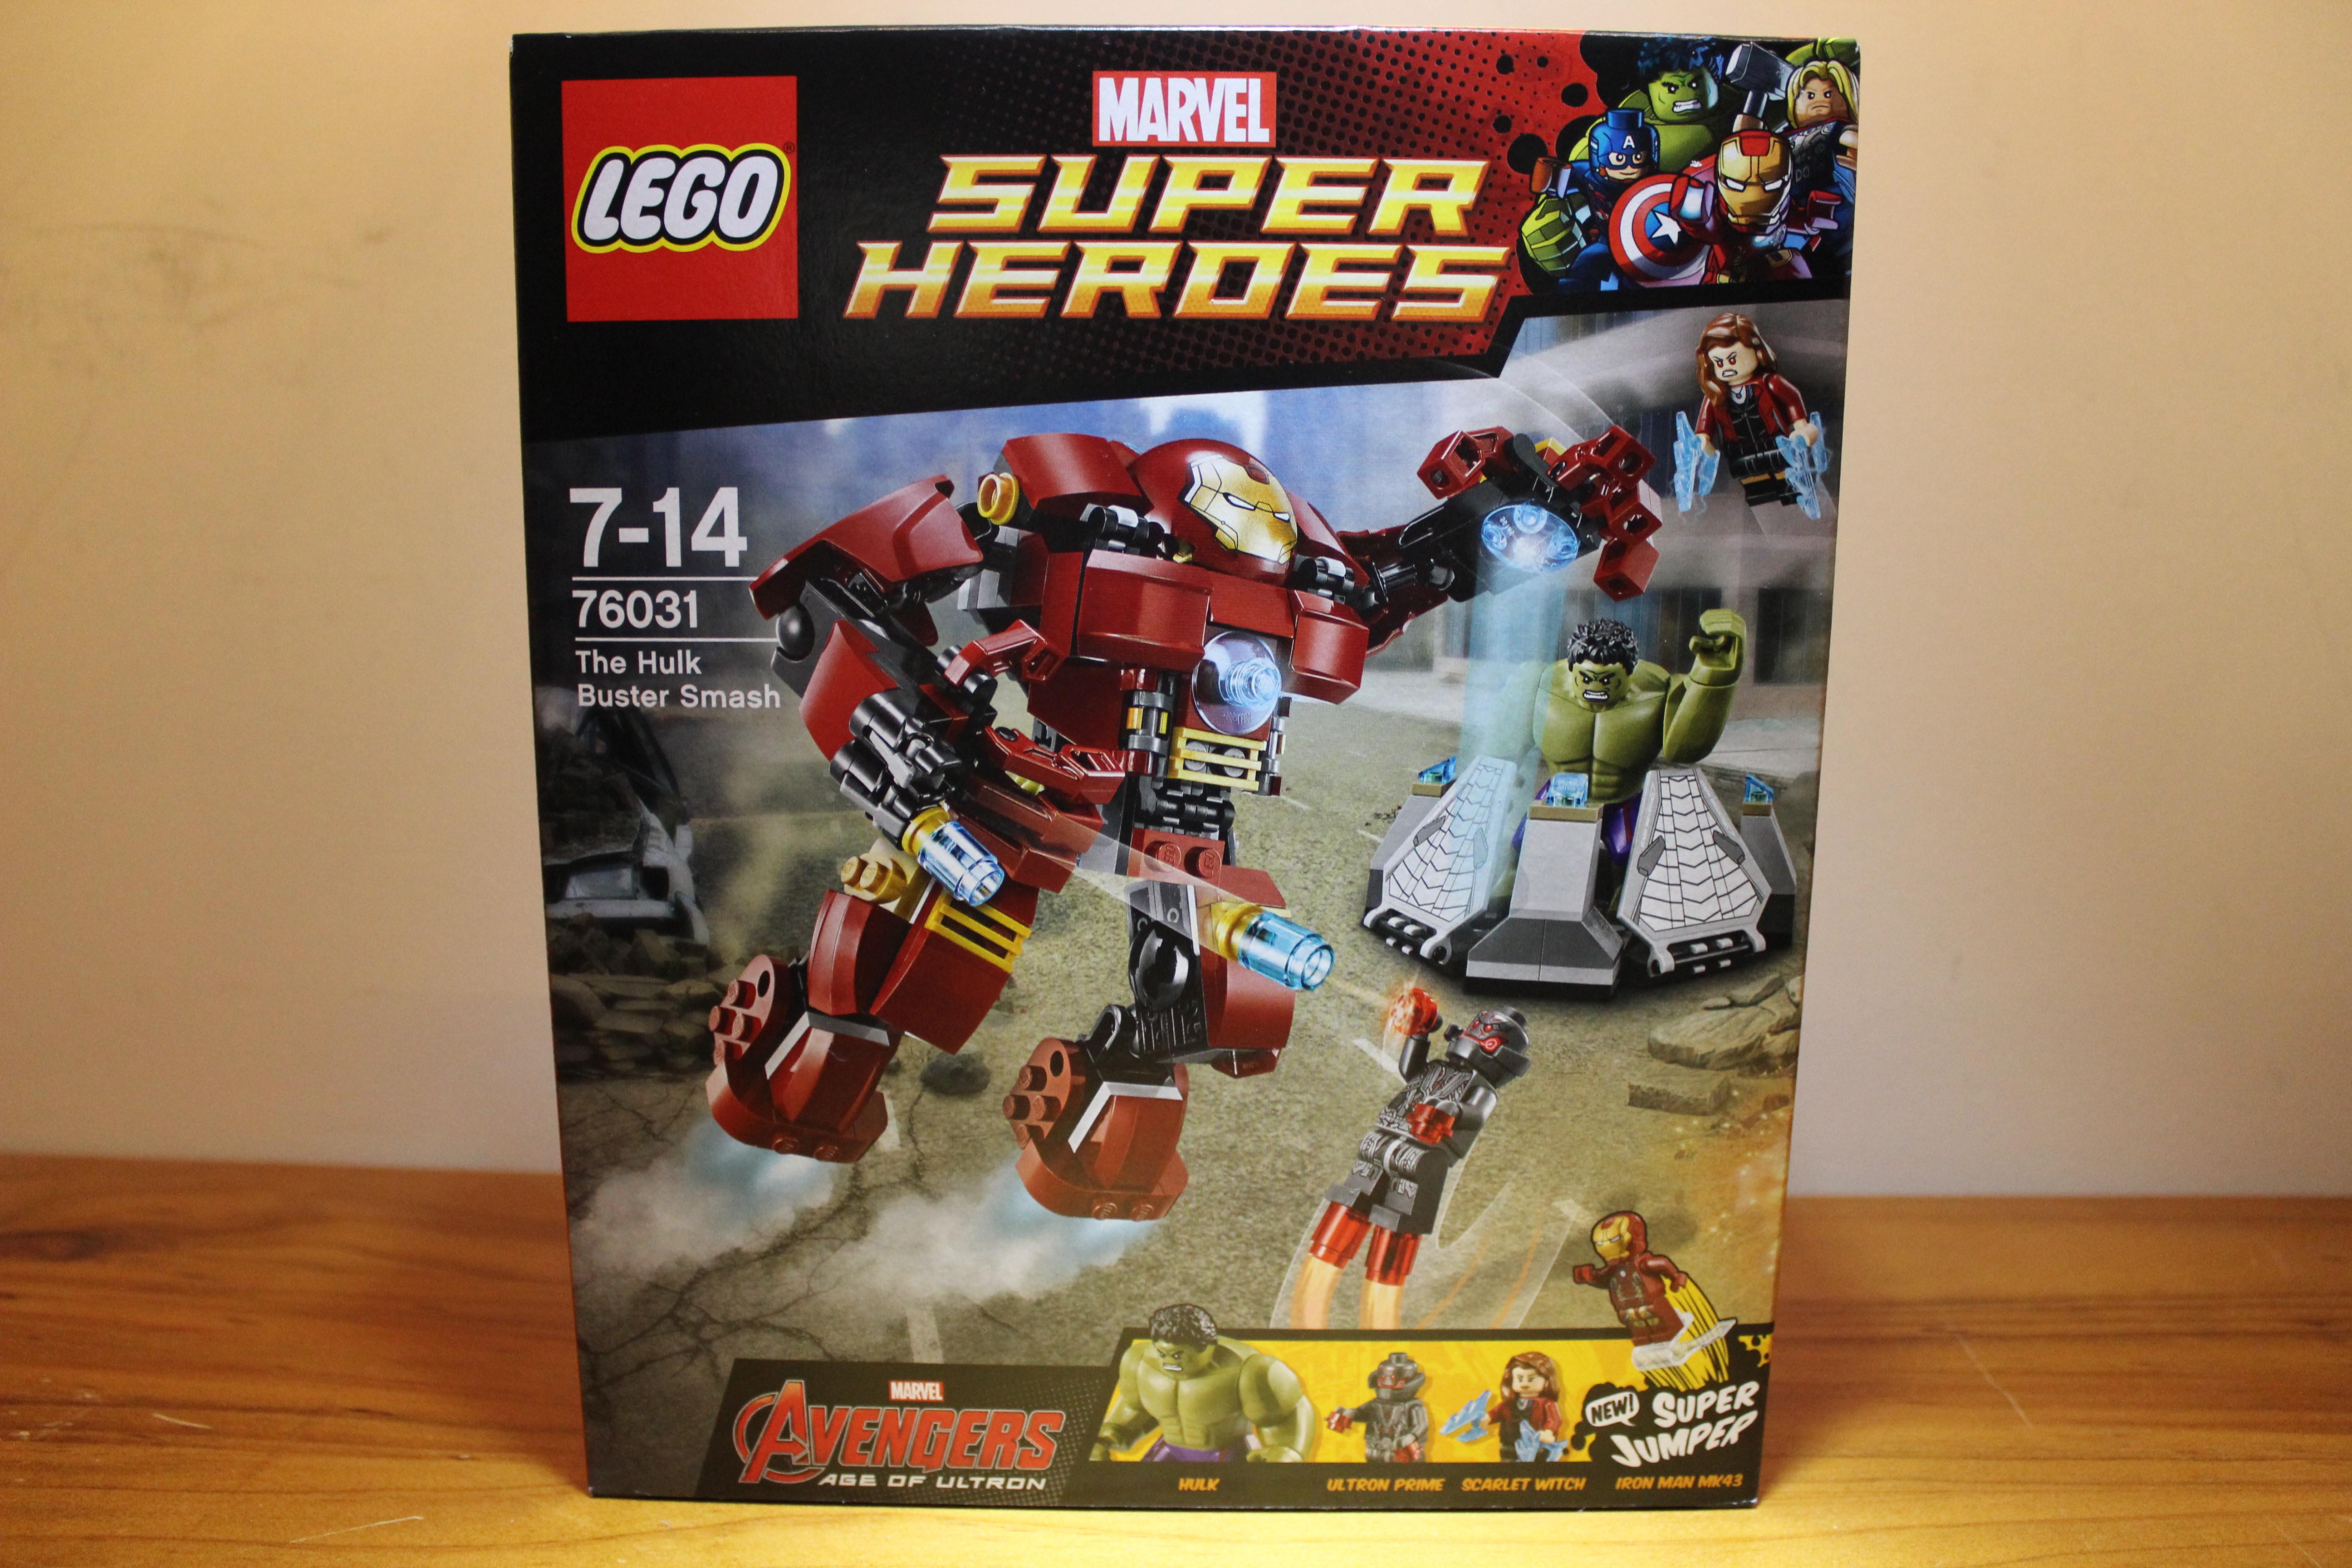 Lego The Hulk Buster Smash Review - Set 76031 - YouTube